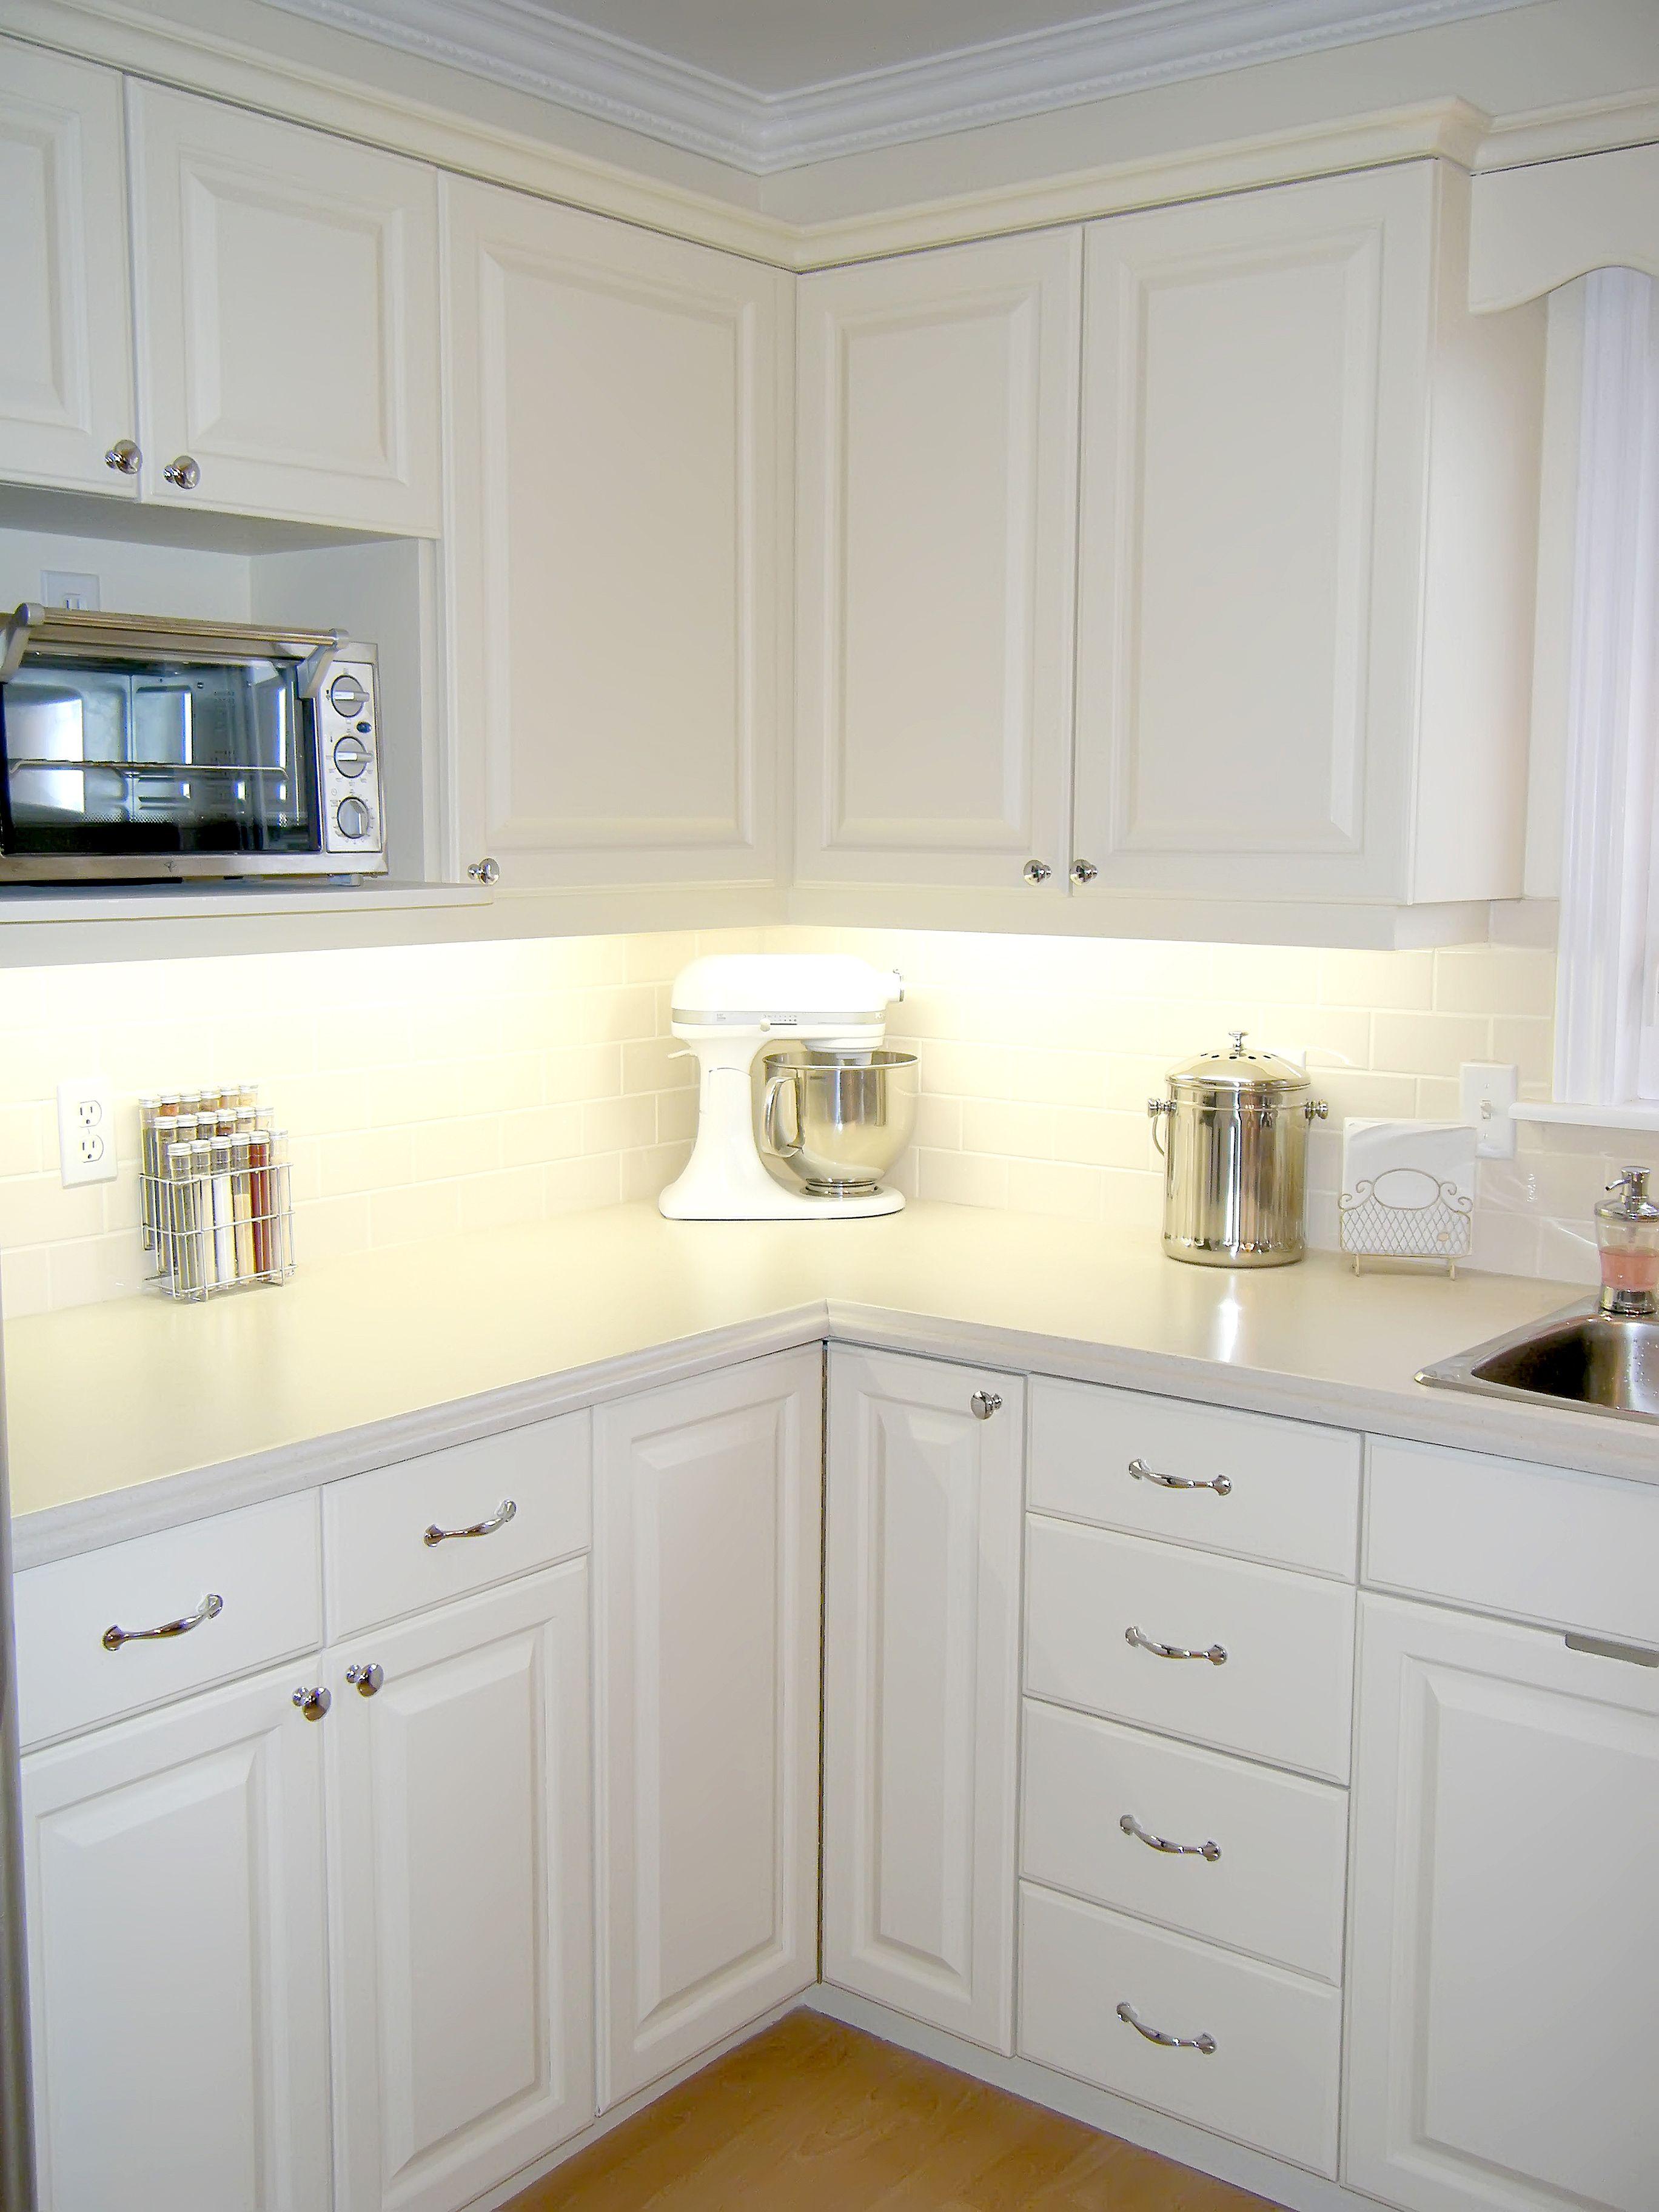 Painting Kitchen Kitchen renovation, Kitchen